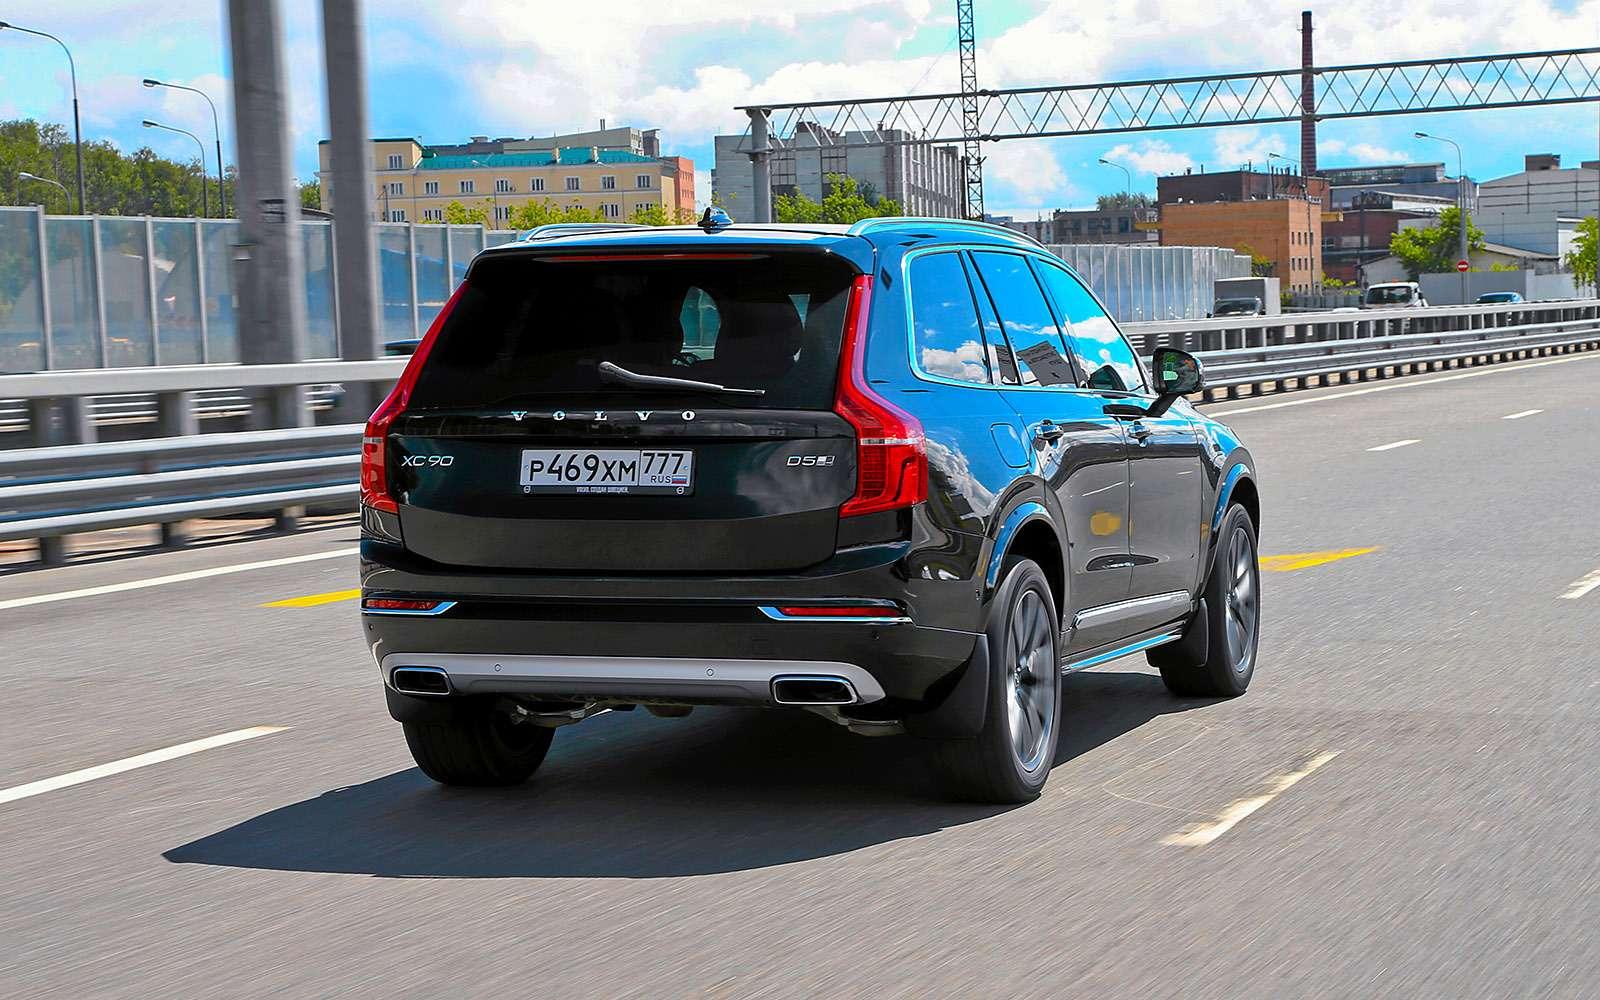 Новый Land Rover Discovery против конкурентов— тест ЗР— фото 784695